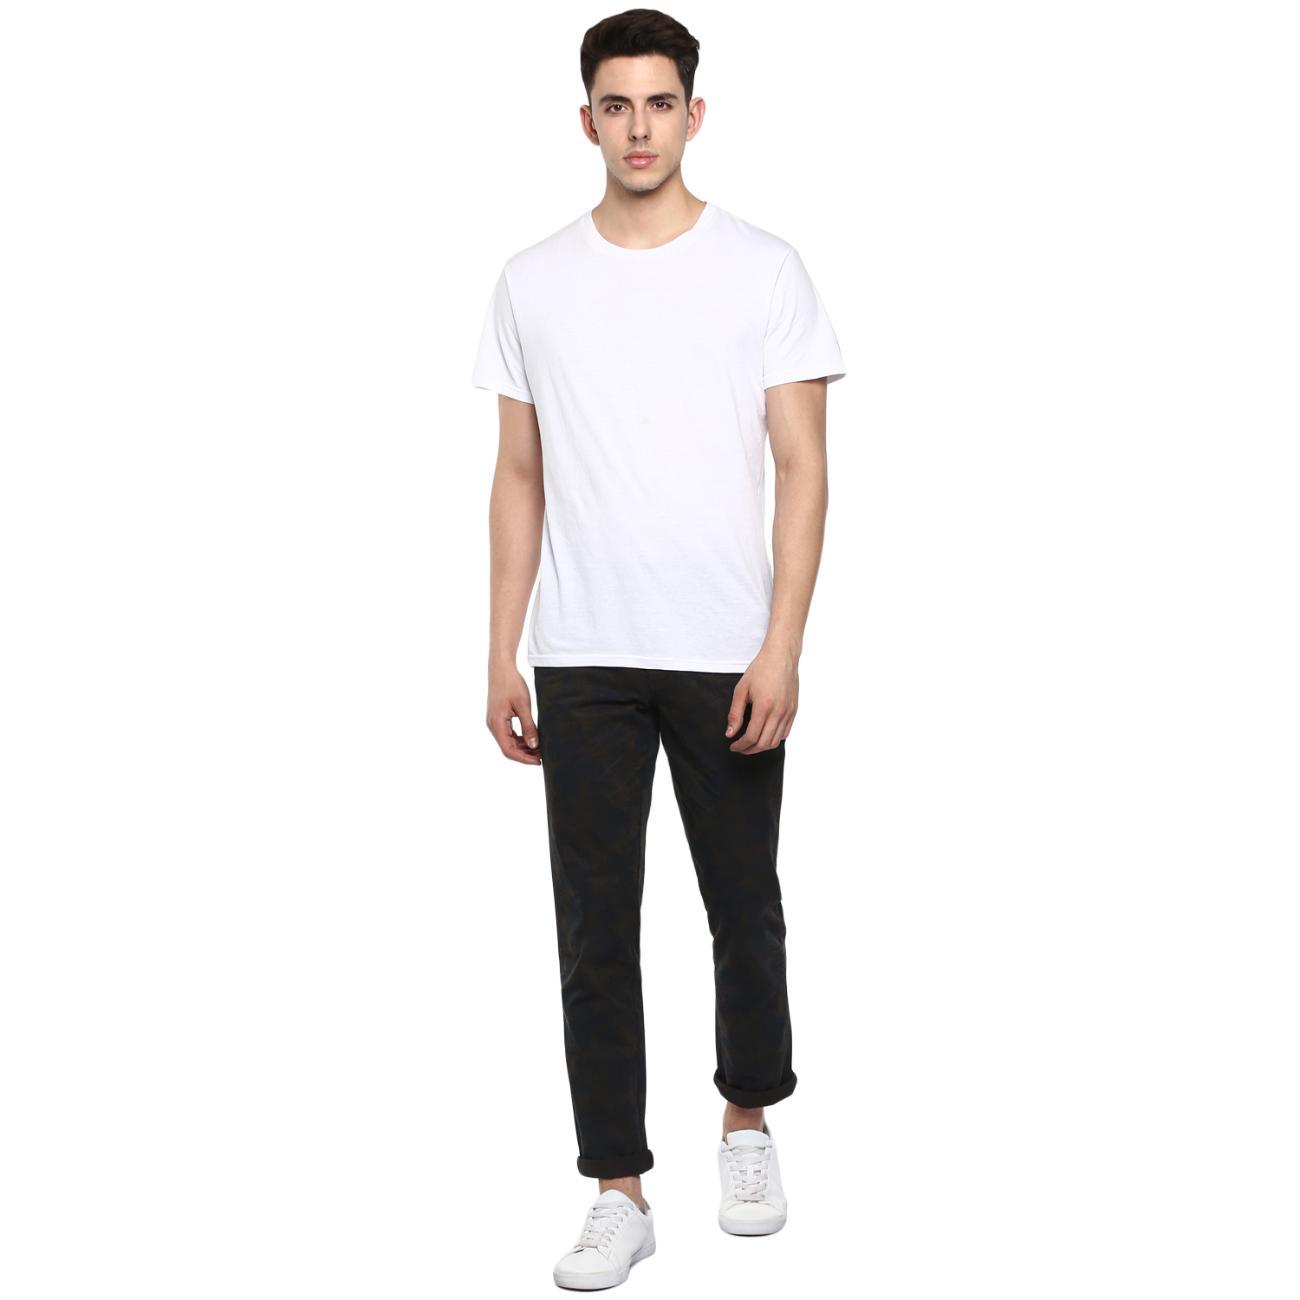 Buy Online Olive/Black Trouser